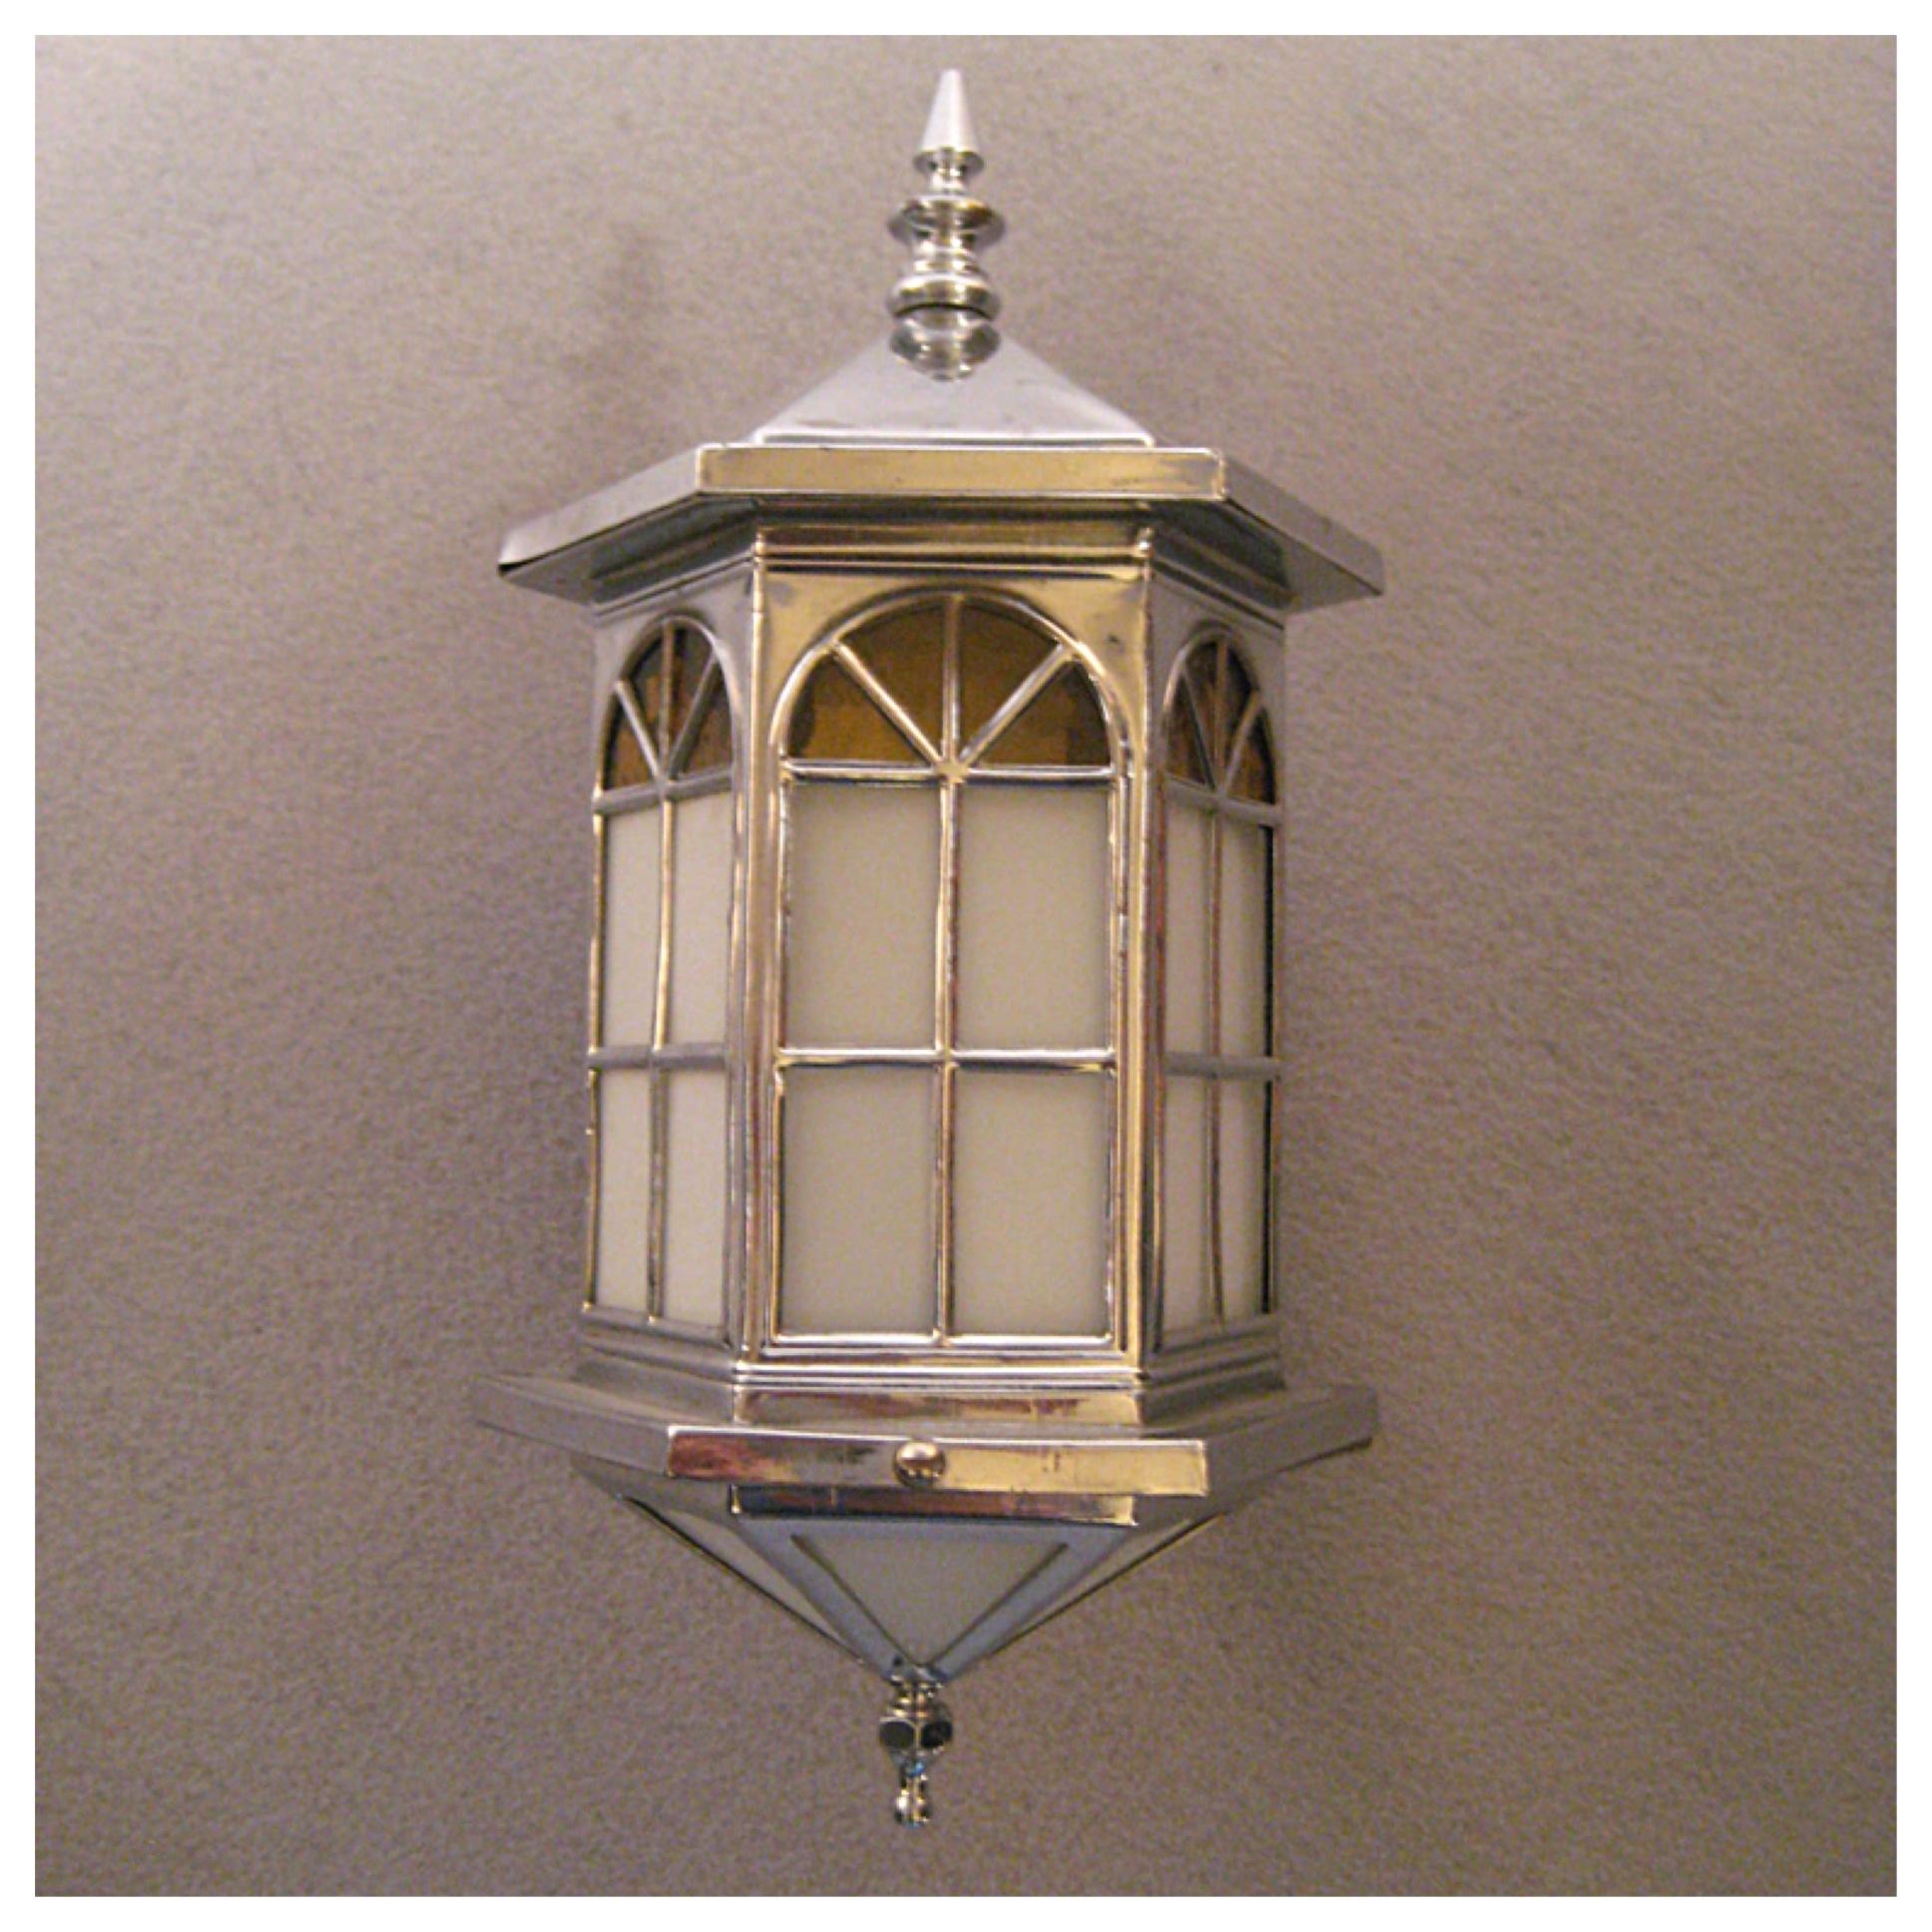 A3515 Pair Of Exterior Wall Lanterns Bogart Bremmer Bradley Antiques